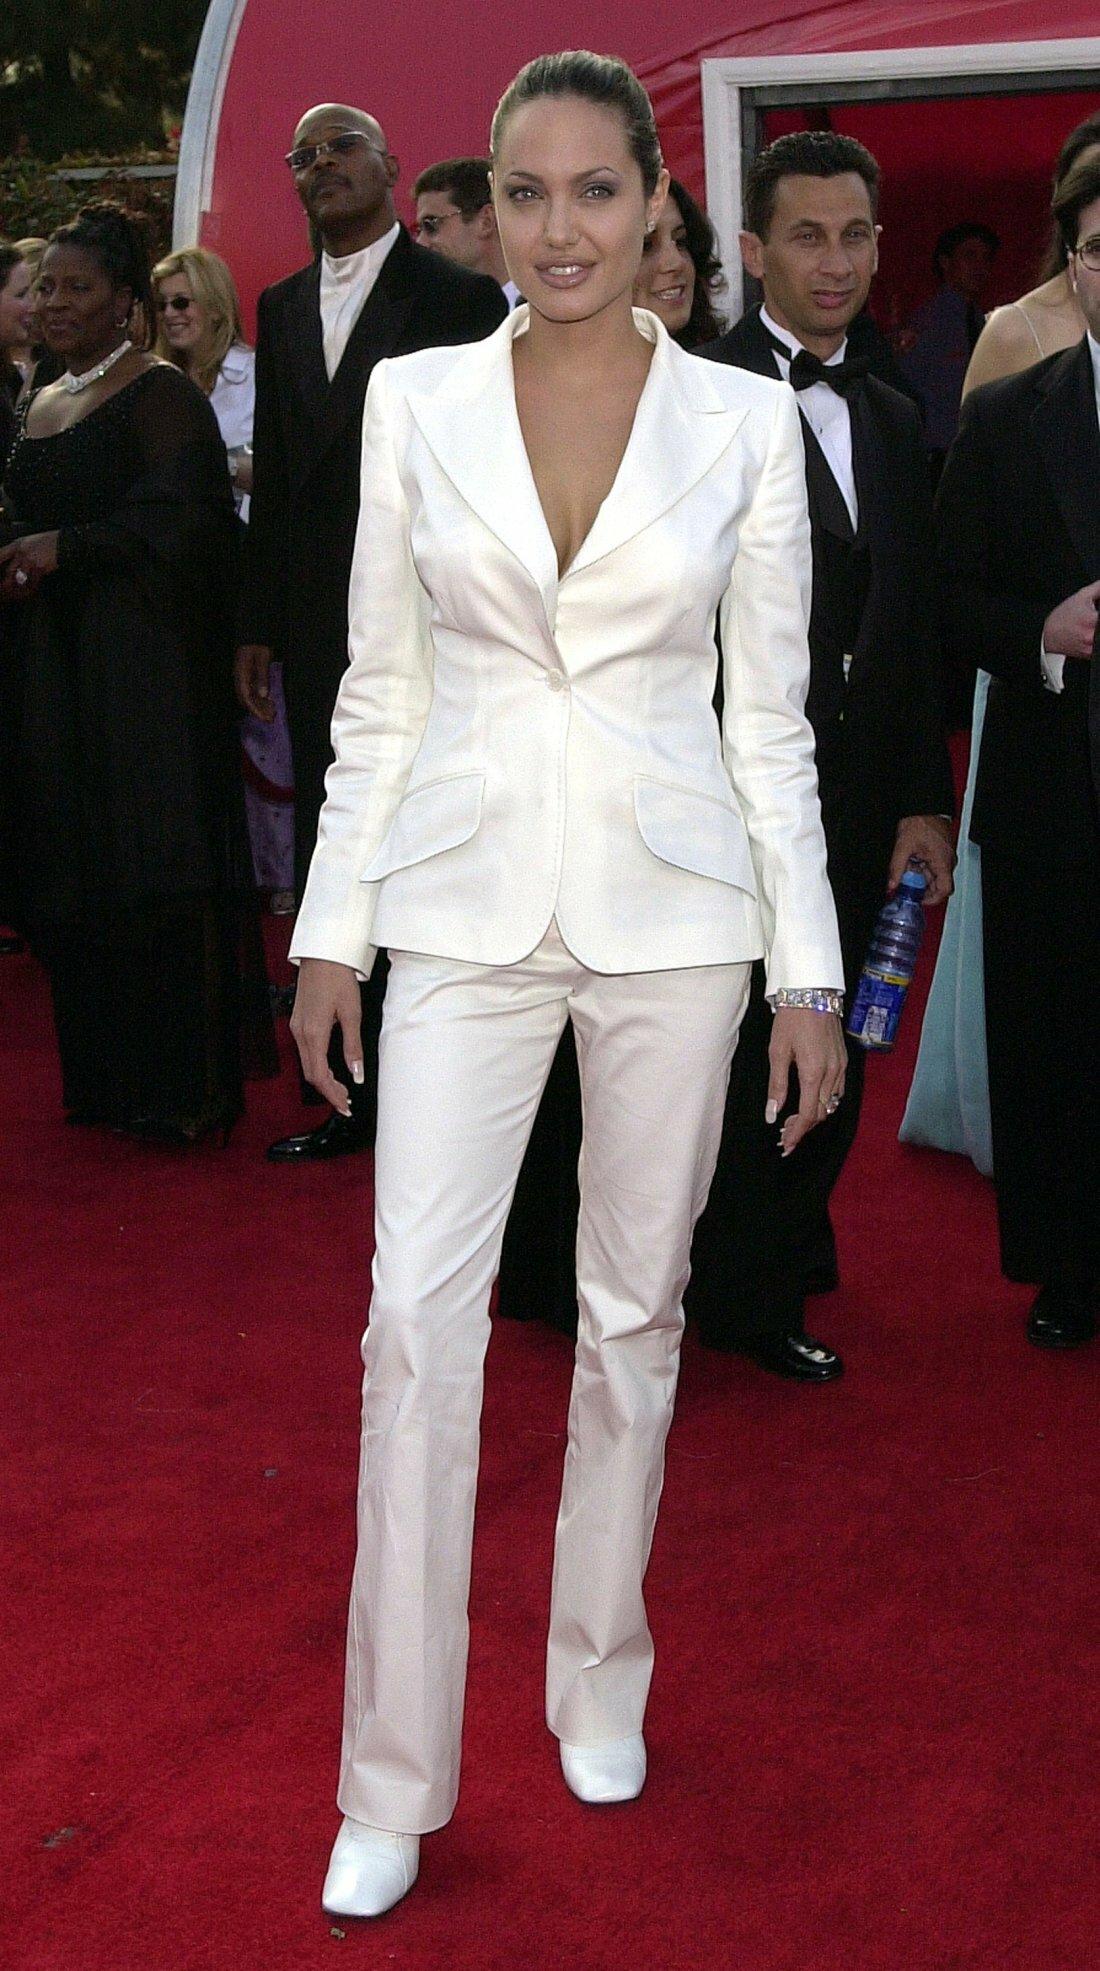 Thời trang Angelina Jolie qua hai thập niên - page 2 - 8